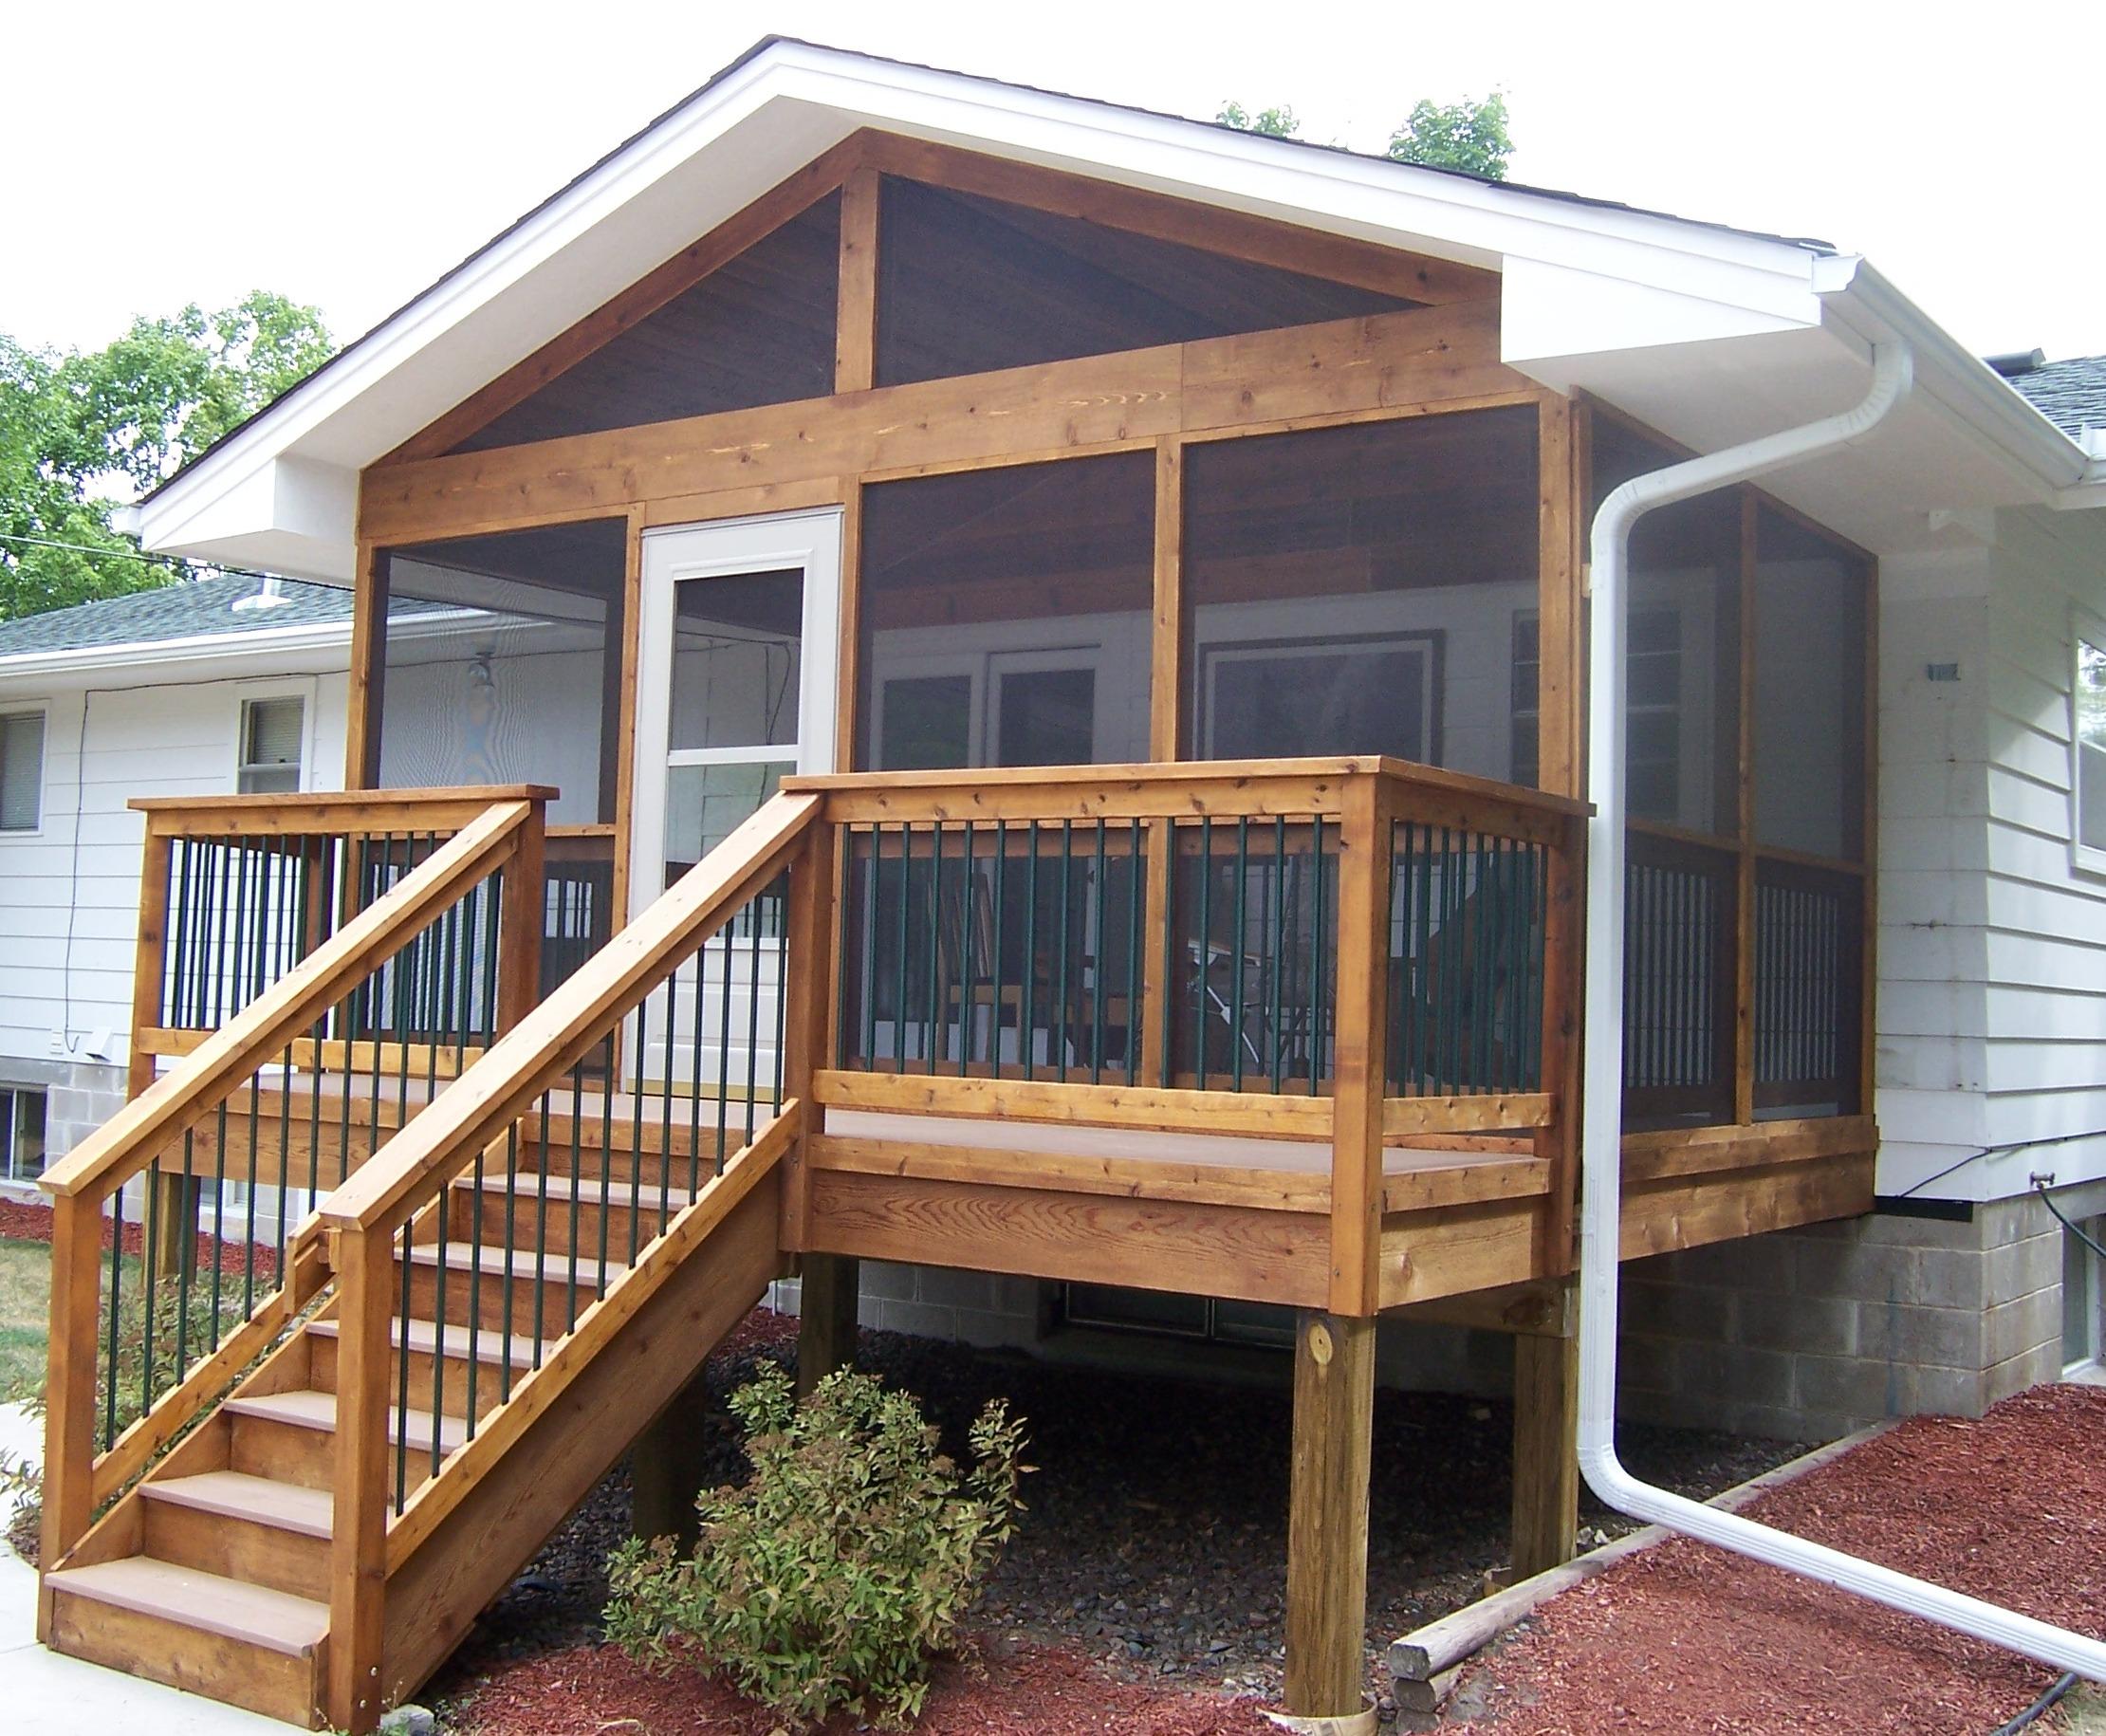 16 Small Decks And Porches Ideas Architecture Plans 6917